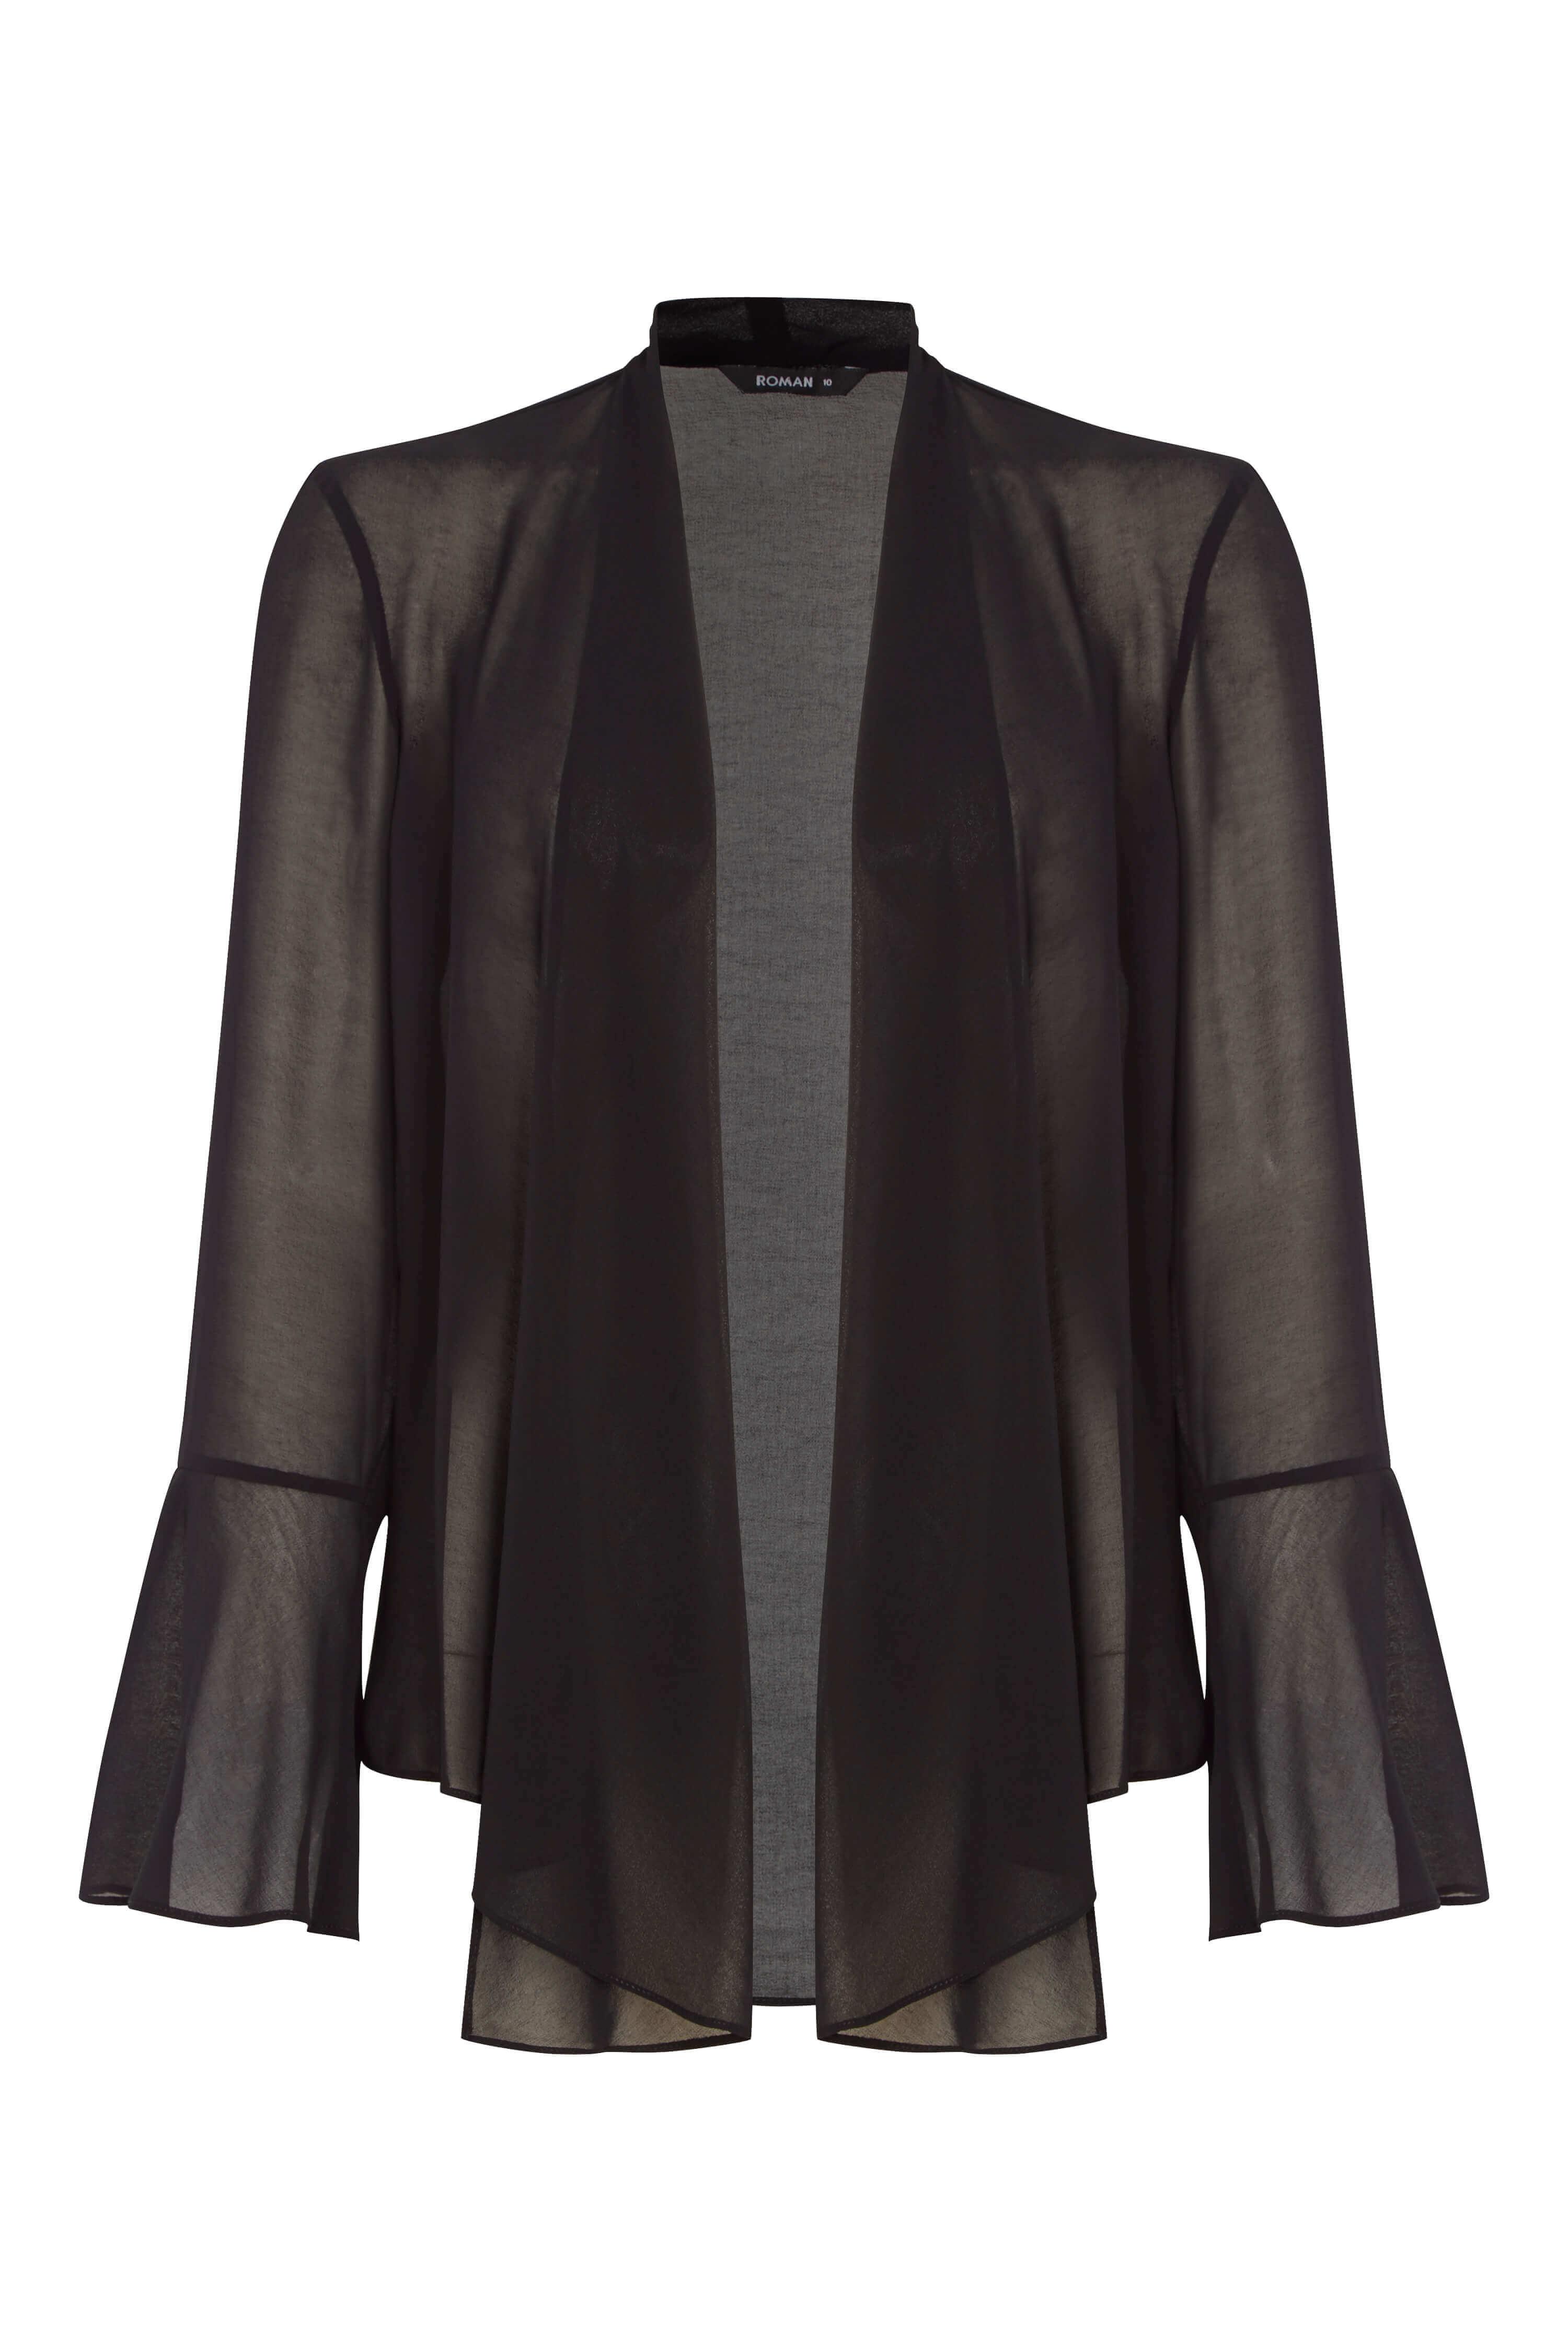 Roman-Originals-Women-039-s-Black-Sheer-Chiffon-Jacket-Sizes-10-20 thumbnail 15